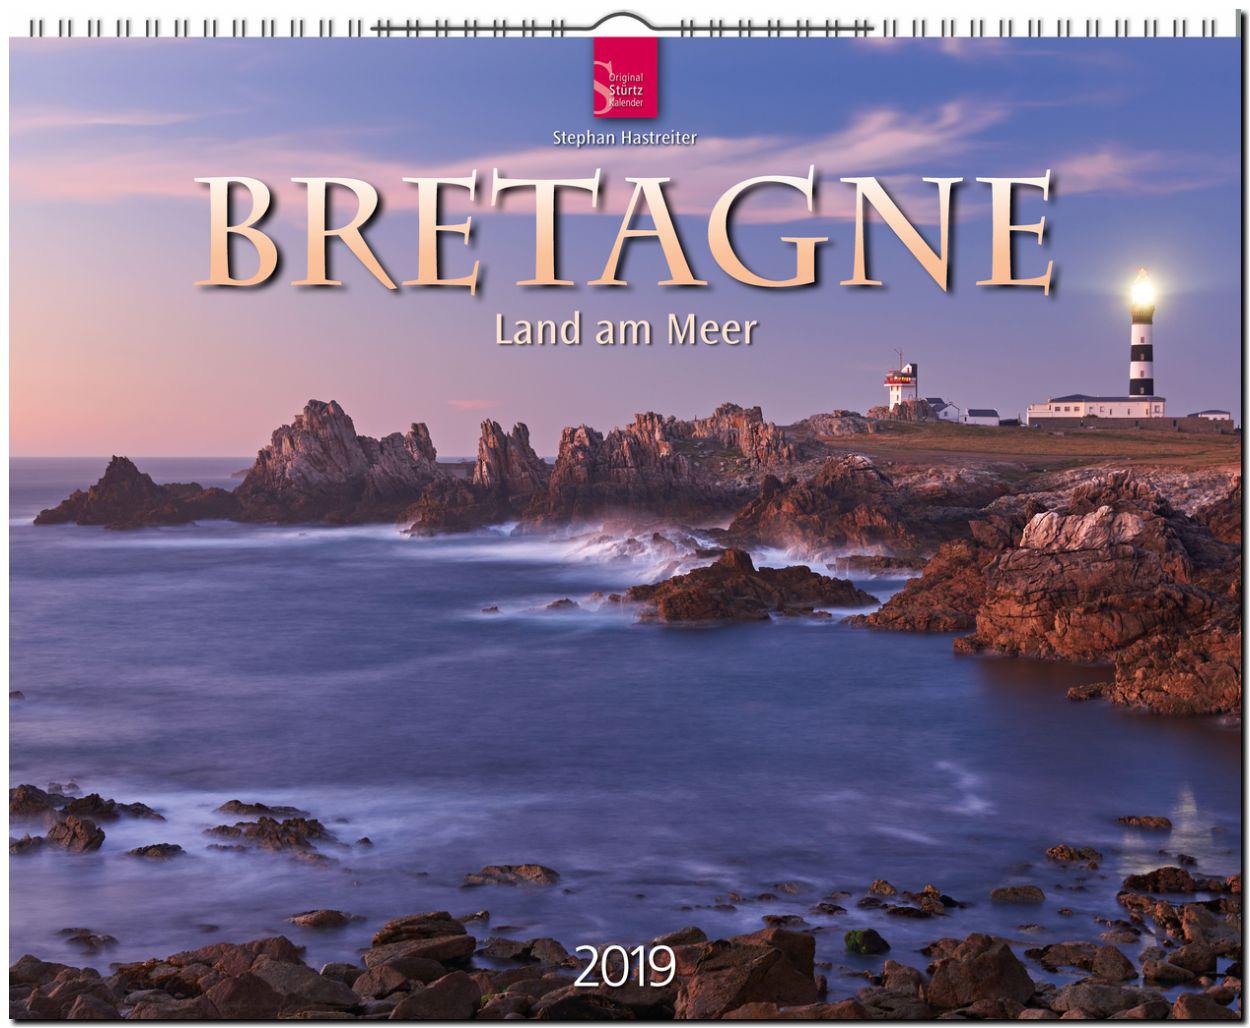 Bretagne, Kalender, Bretagne 2019, Land am Meer, Stephan Hastreiter, Bretagne Land am Meer 2019